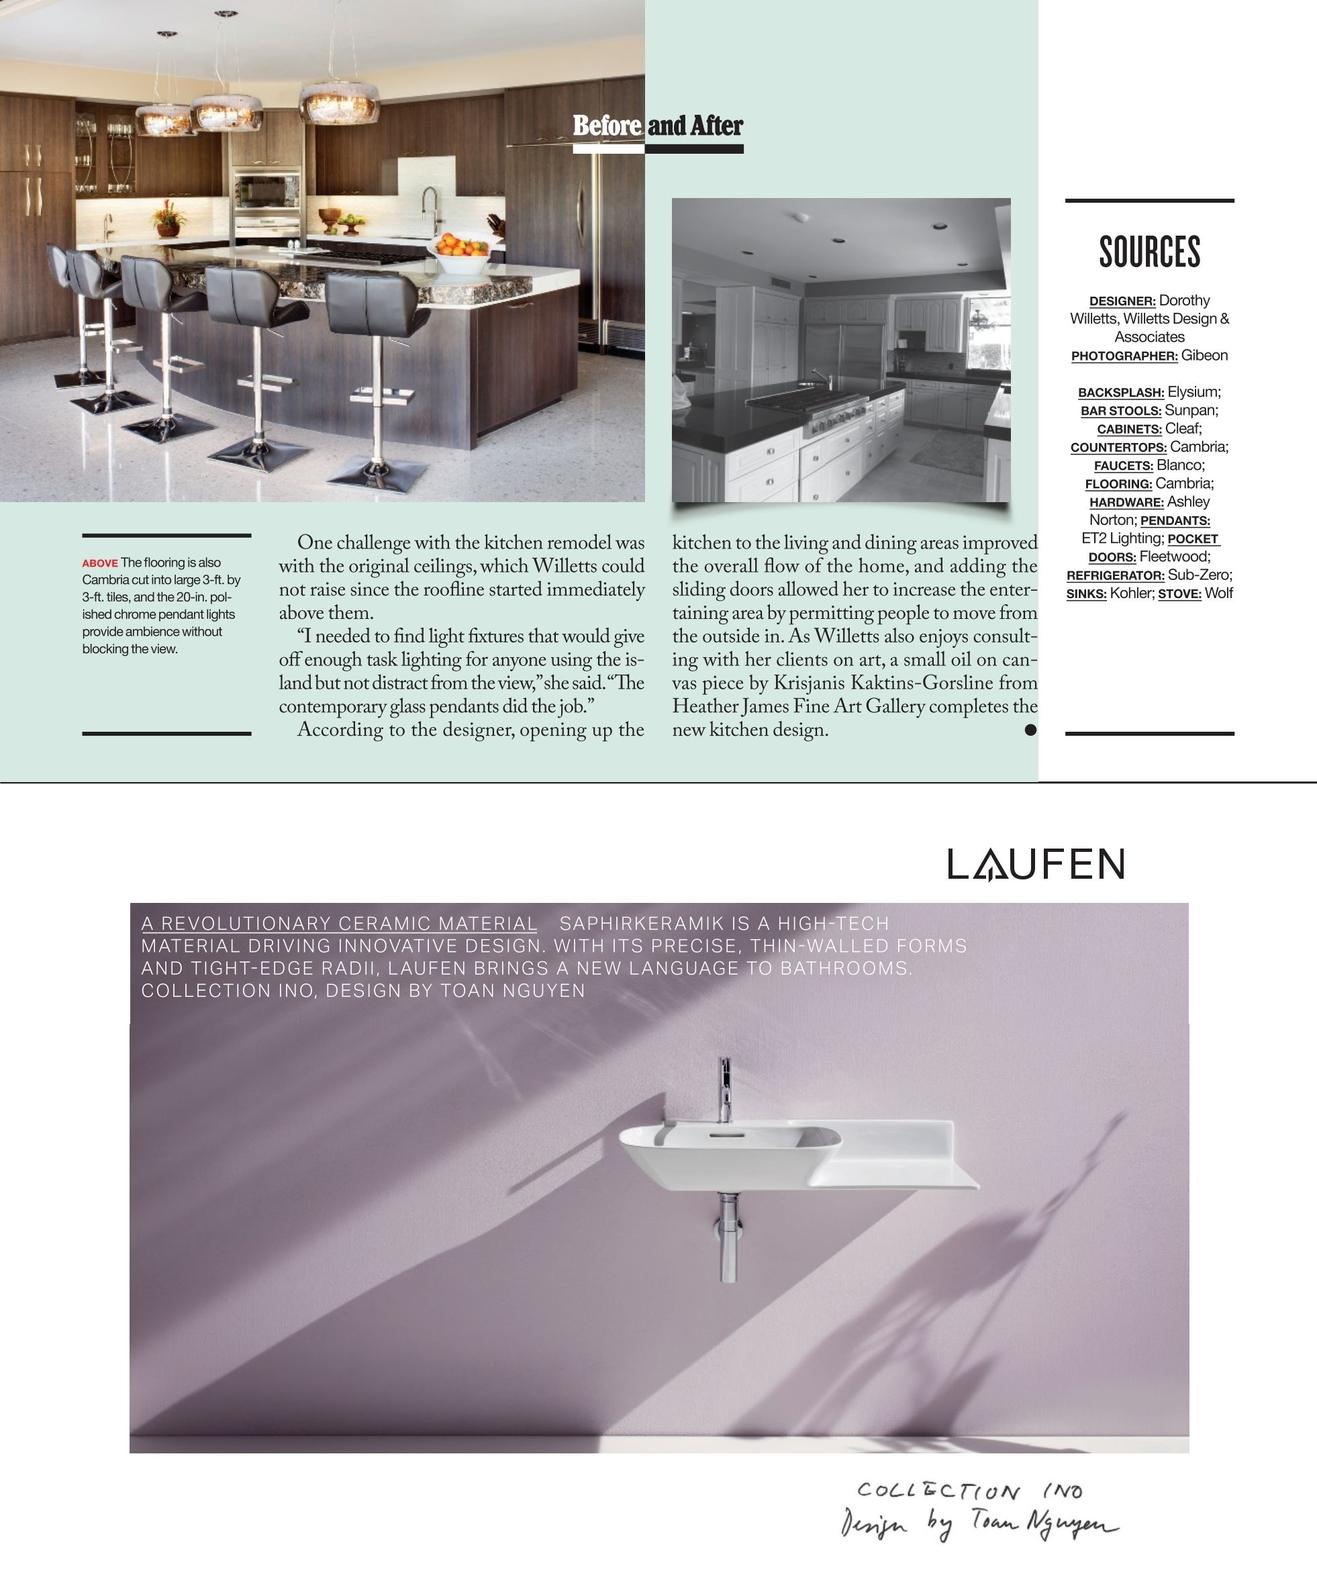 Kitchen & Bath Business - September 2016 [34 - 35]